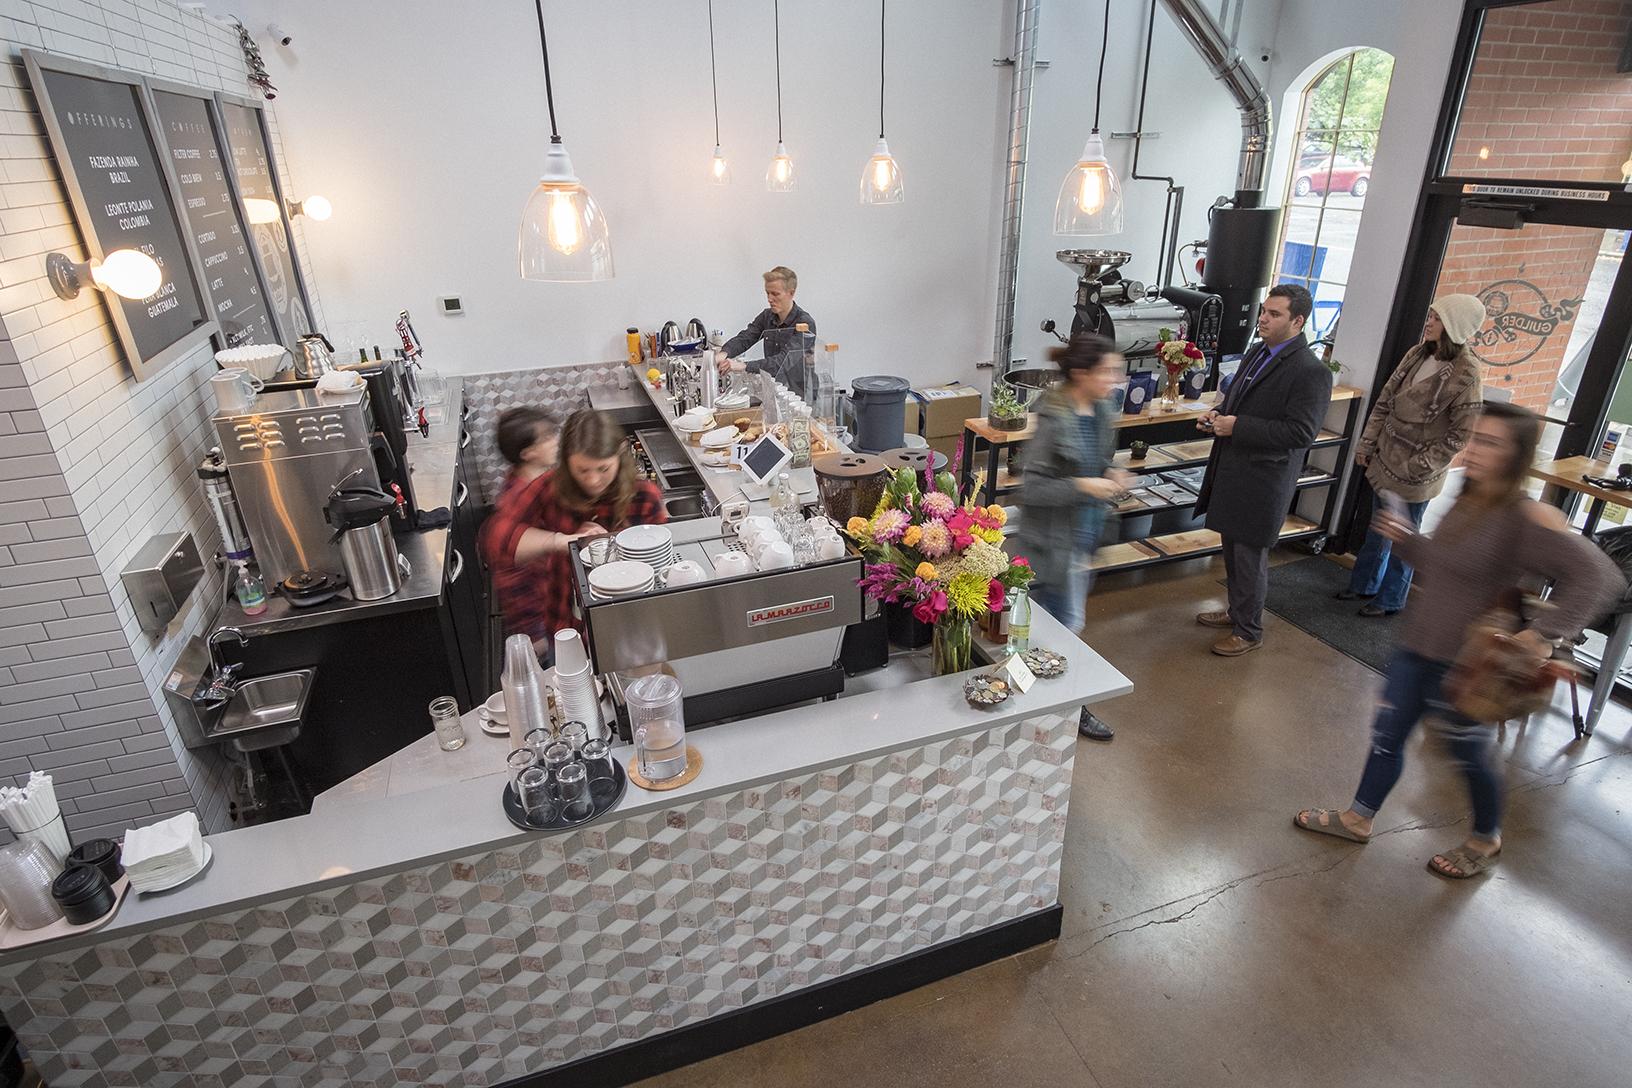 Guilder+Coffee+&+Bar.jpeg